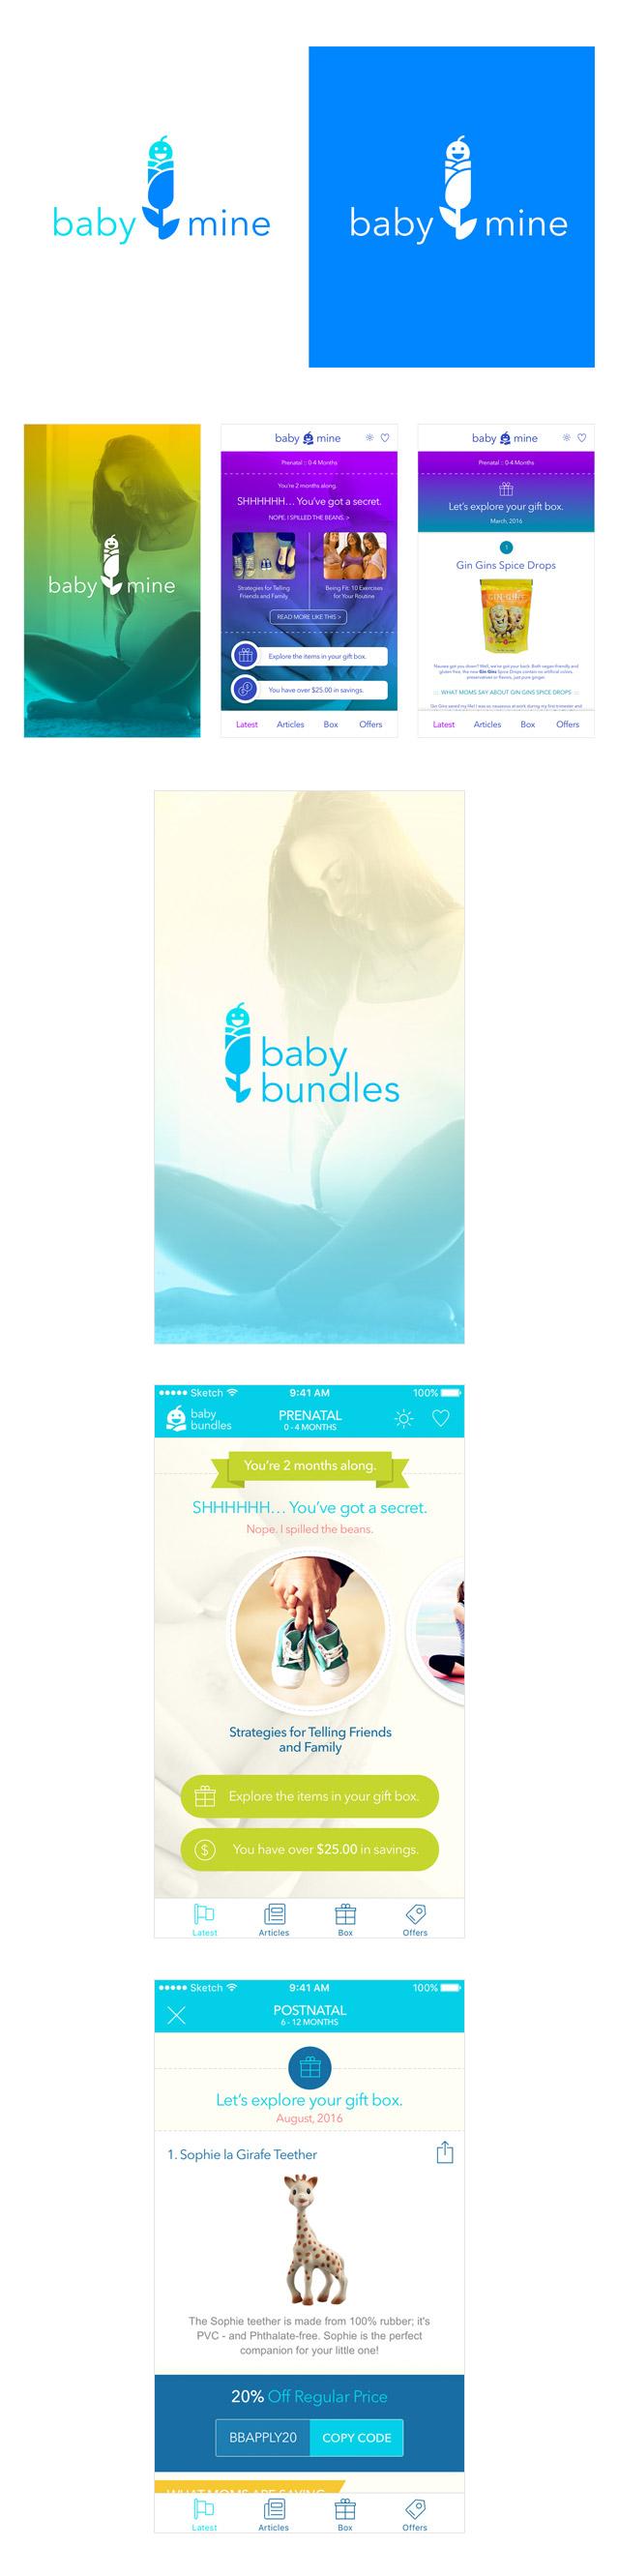 babybundles_full